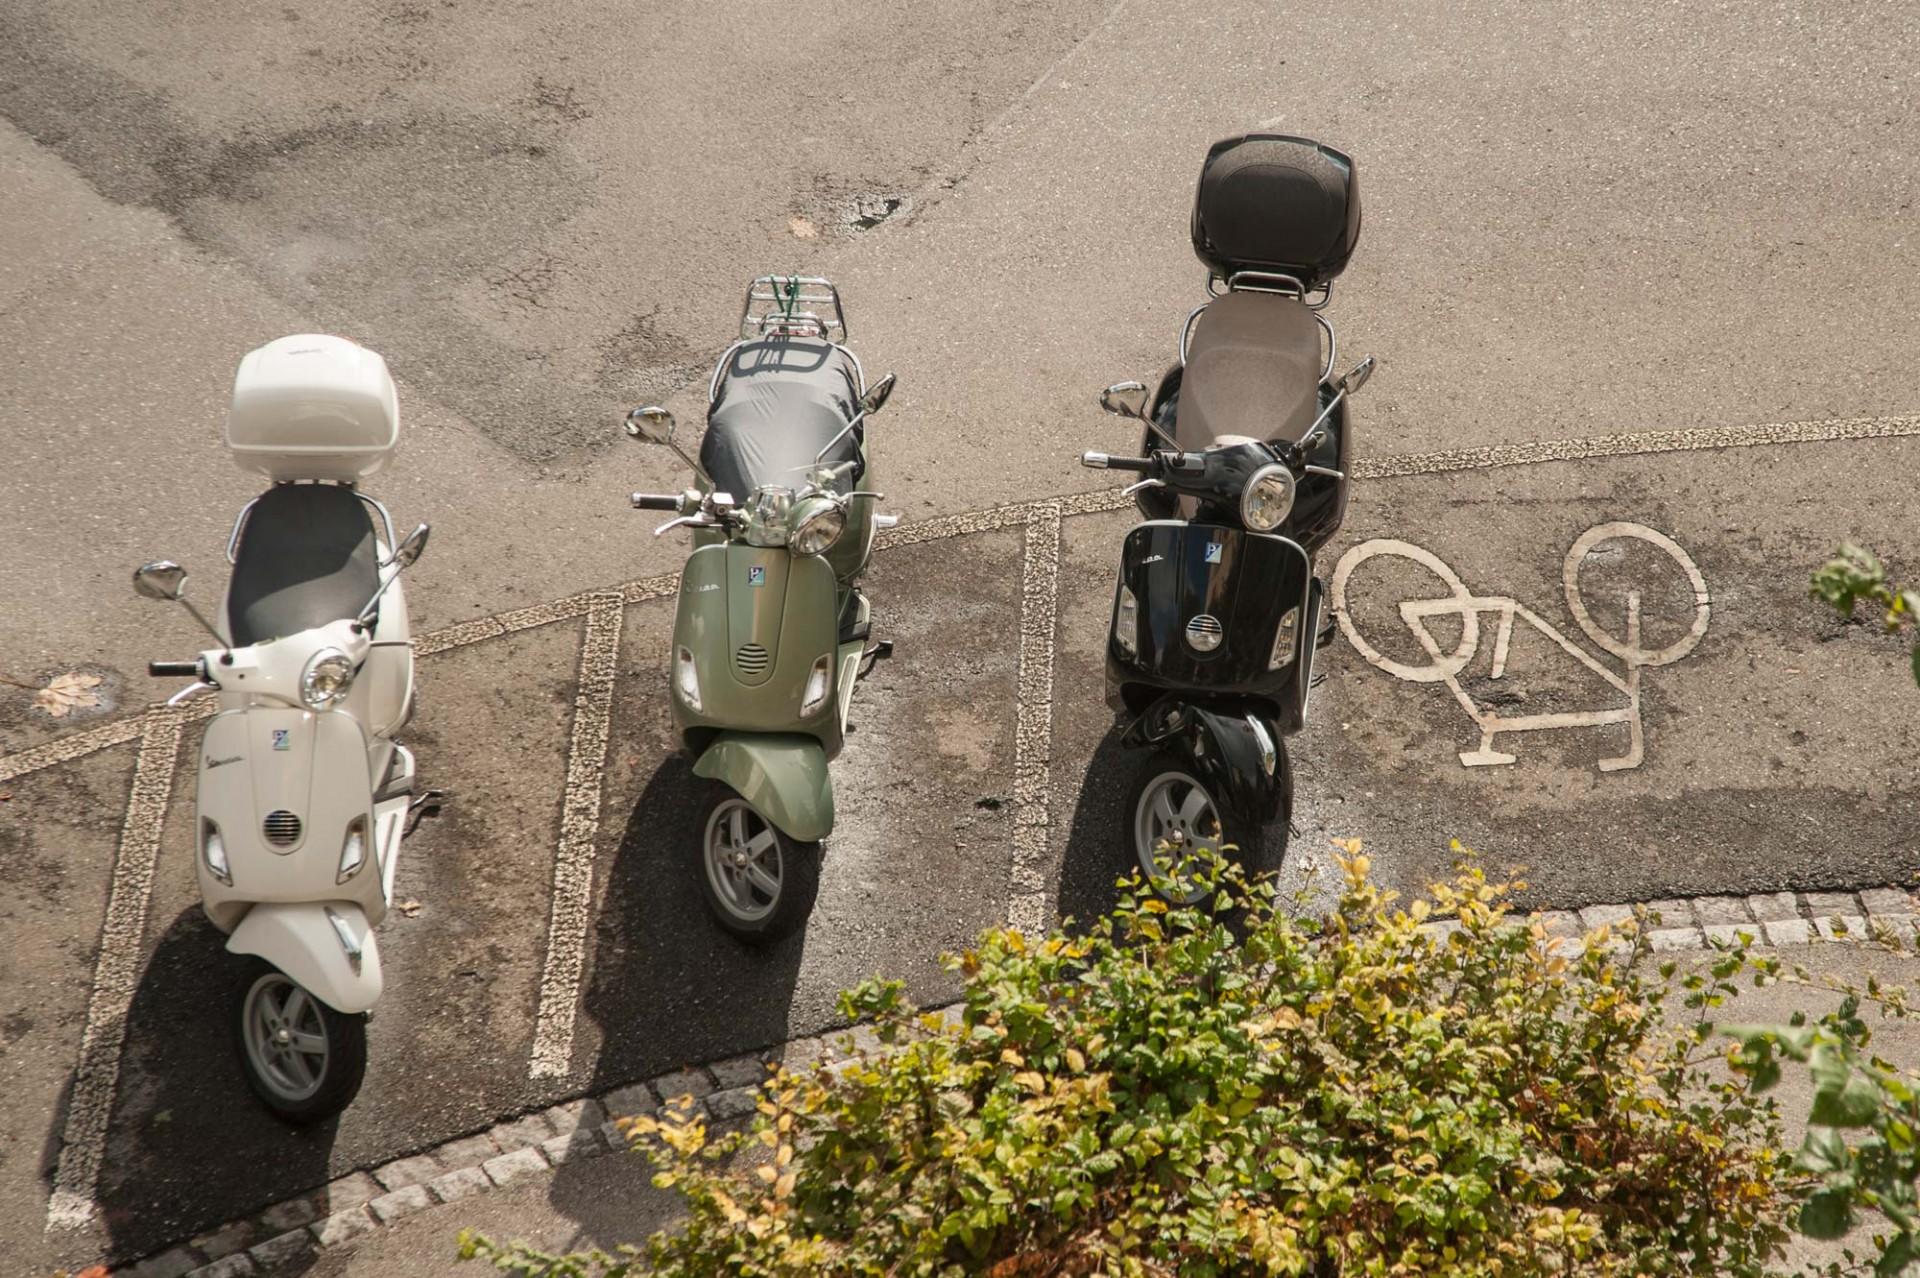 Malaïka Schürch Büro für Mobilität – Photographie